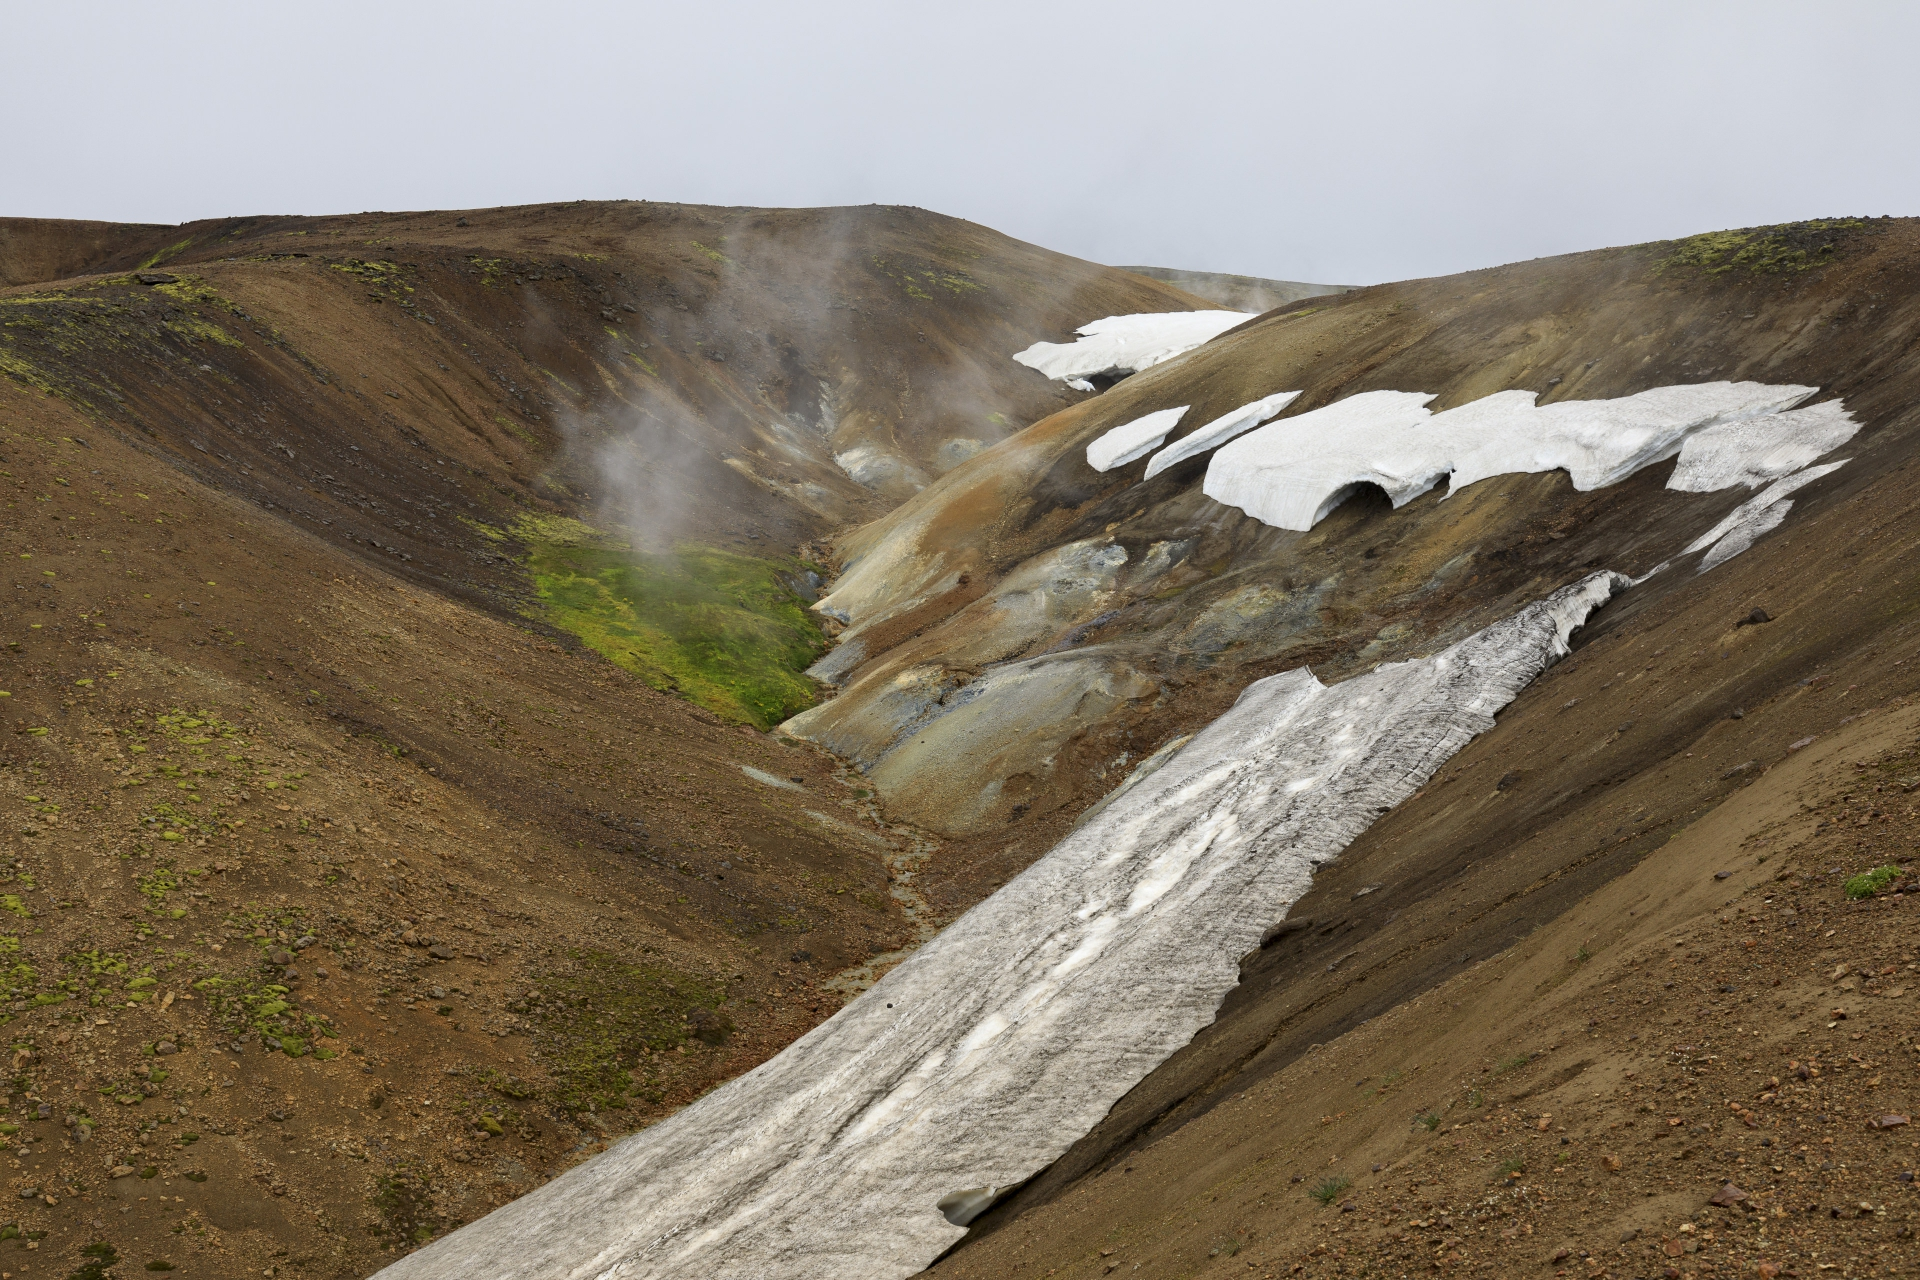 Geothermalgebiet am Fuß des Kaldaklofsfjöll